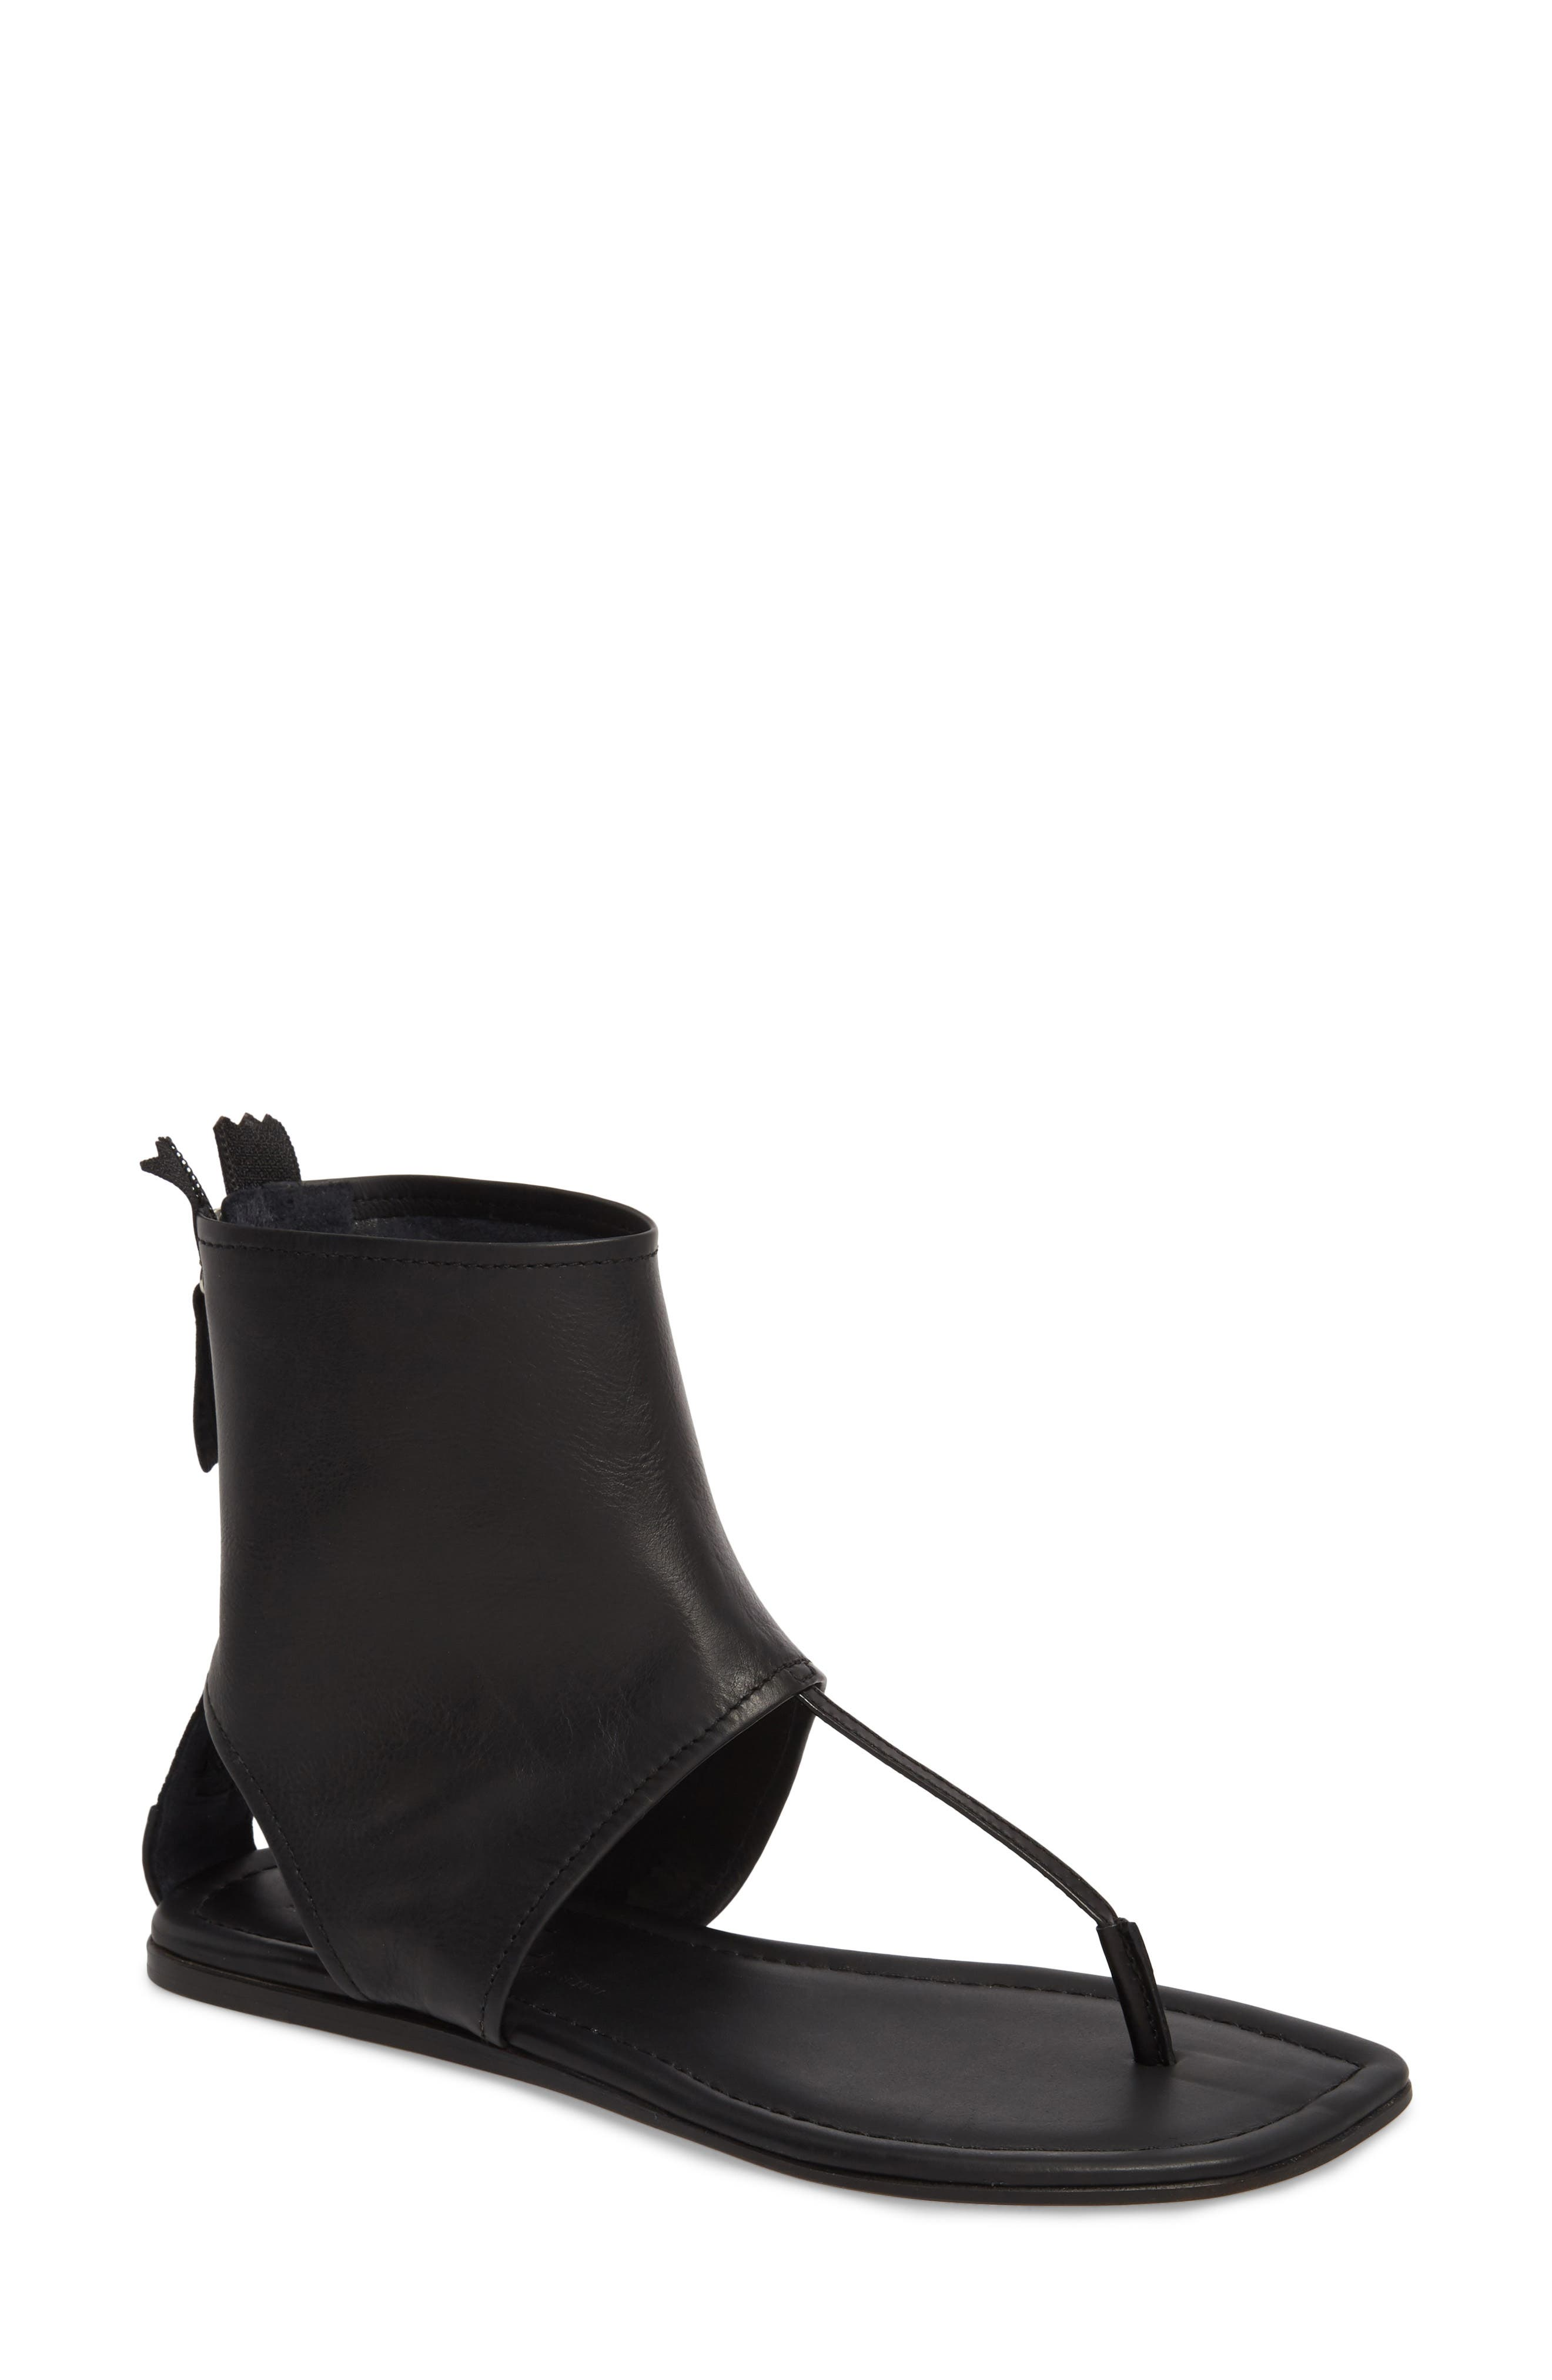 AGL Ankle Shield Thong Sandal, Main, color, 001